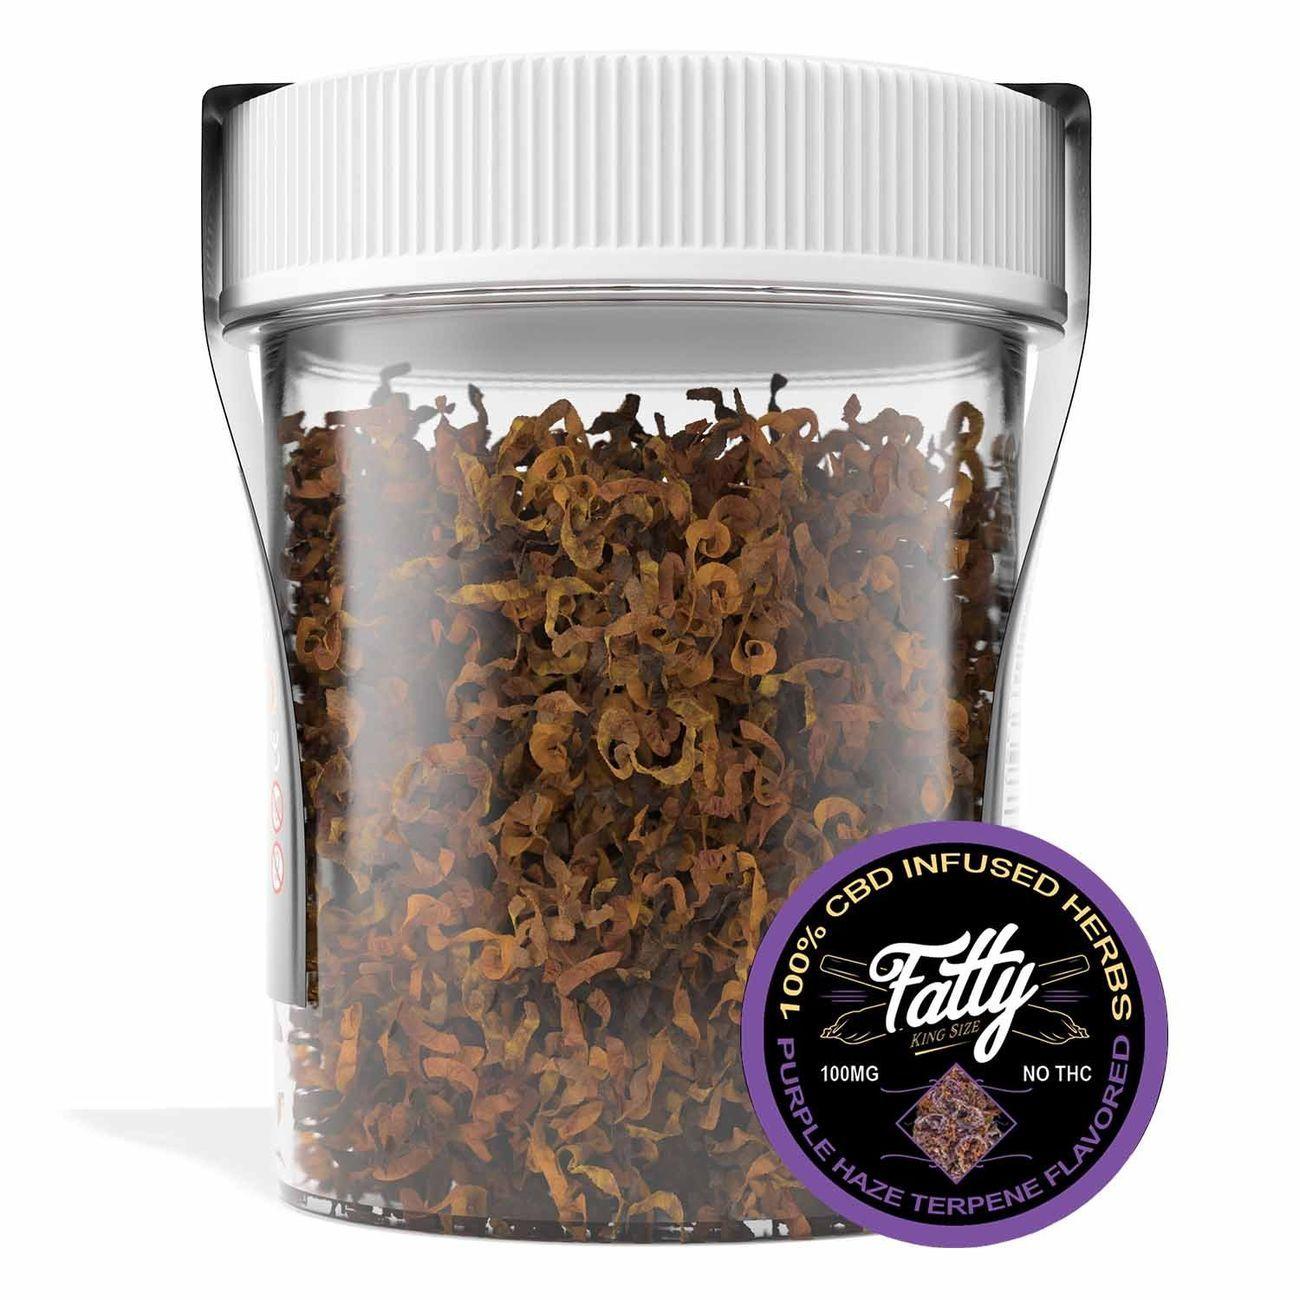 Purple Haze CBD Fatty Loose Herbs are a smokable mix of CBD